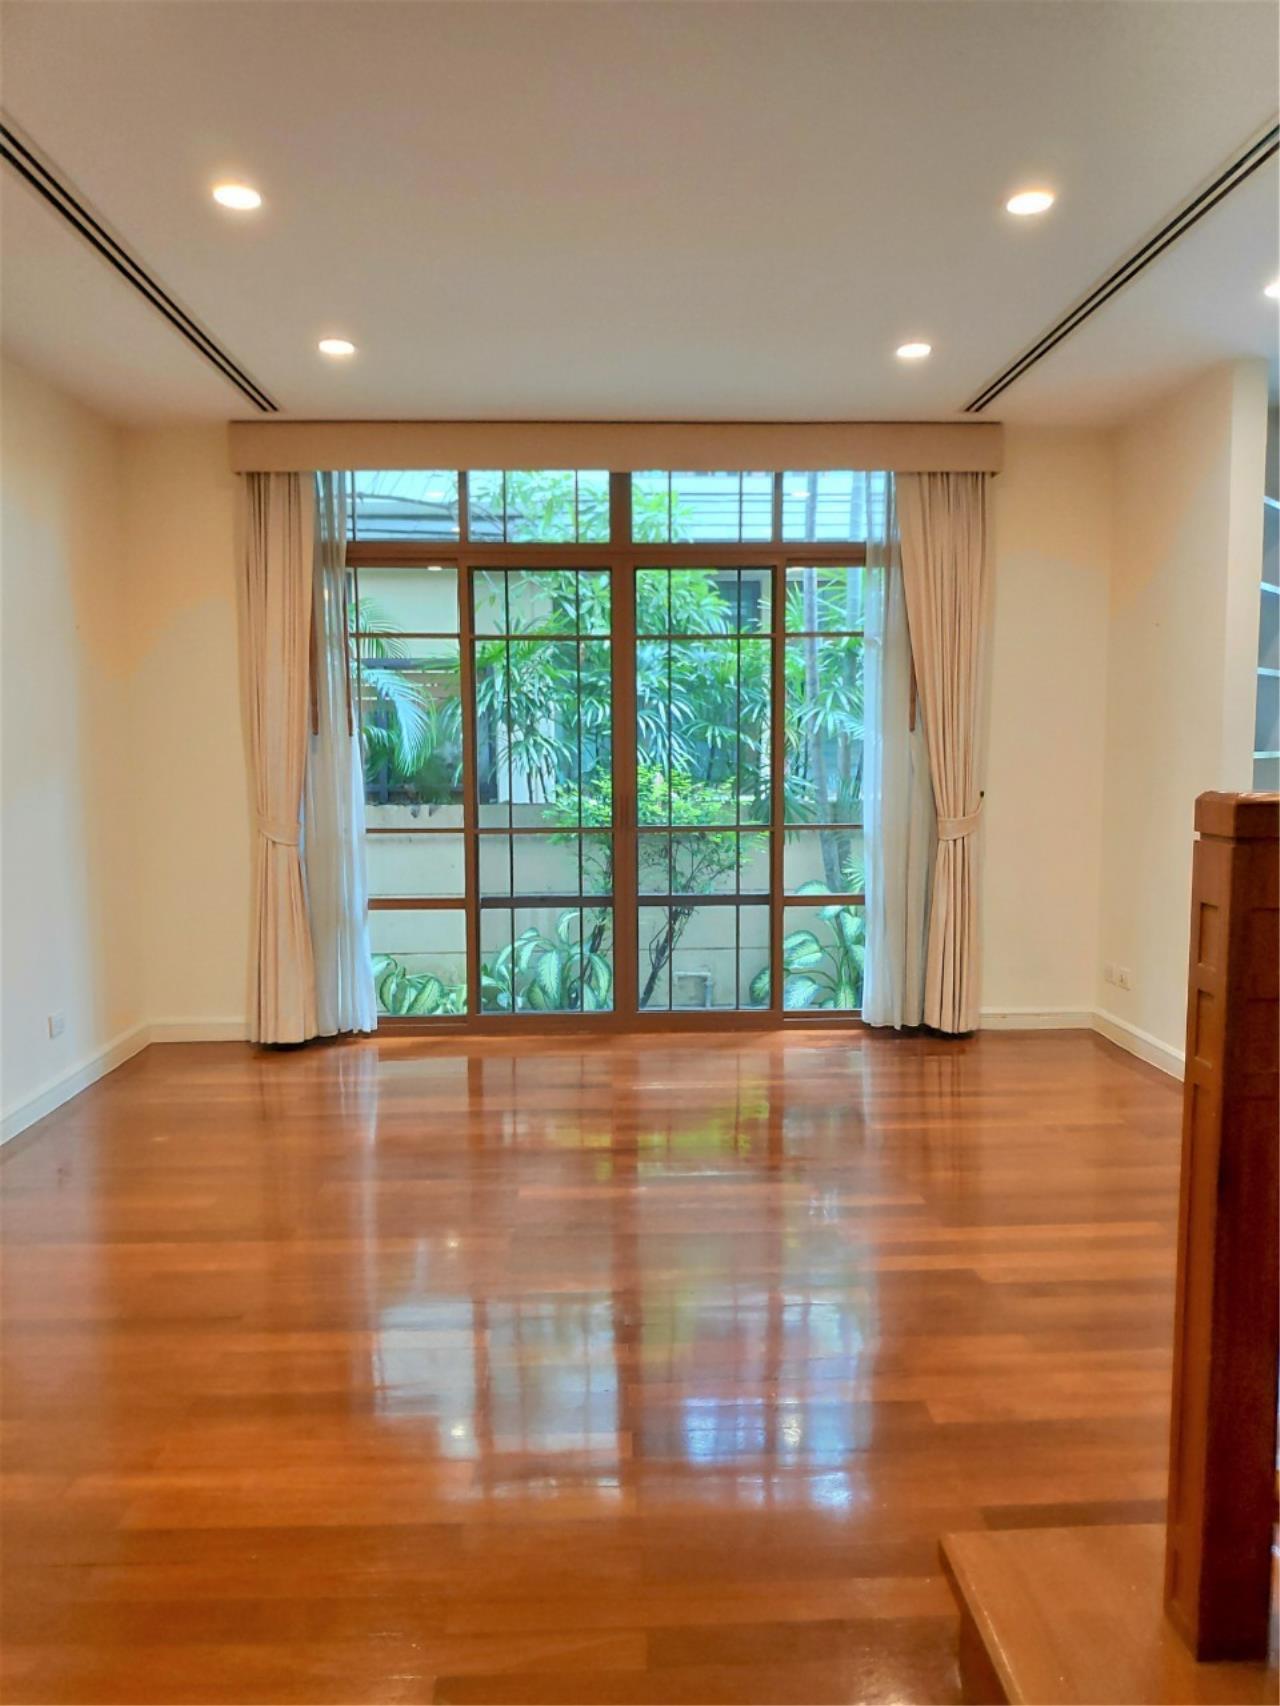 Agent - Natchga Boonkrong  Agency's For Rent House 4 Bedrooms Baan Sansiri Sukhumvit 67 17